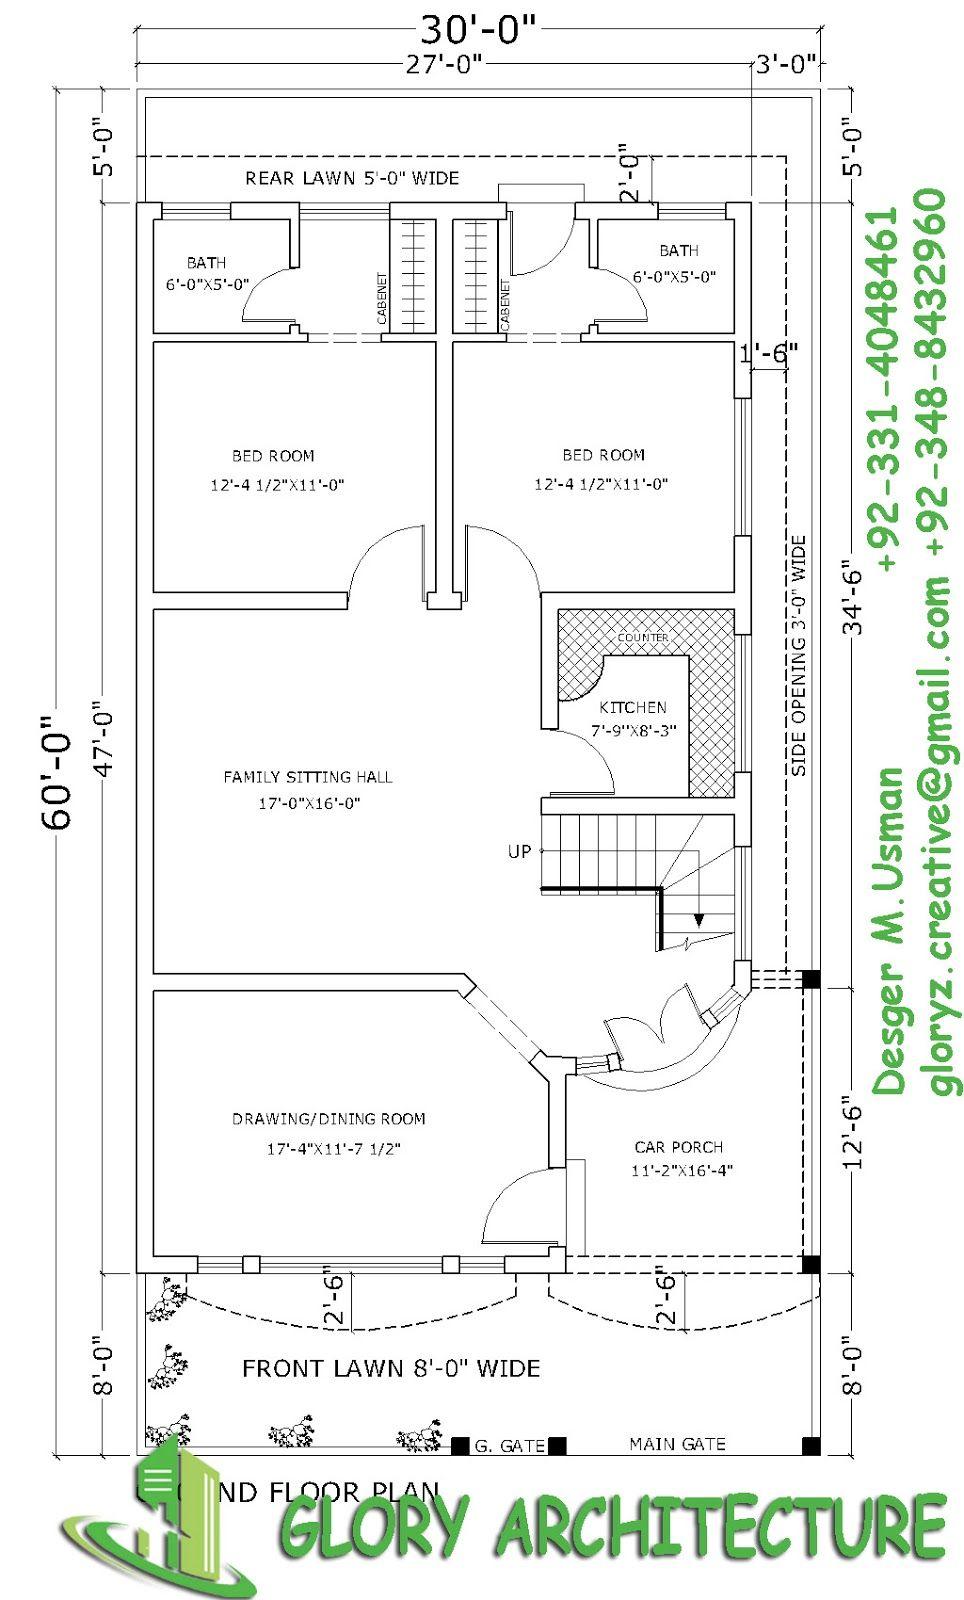 House Elevation Front Elevation 3d Elevation 3d View 3d House Elevation 3d House Plan Hose Plan Archit My House Plans Drawing House Plans 3d House Plans